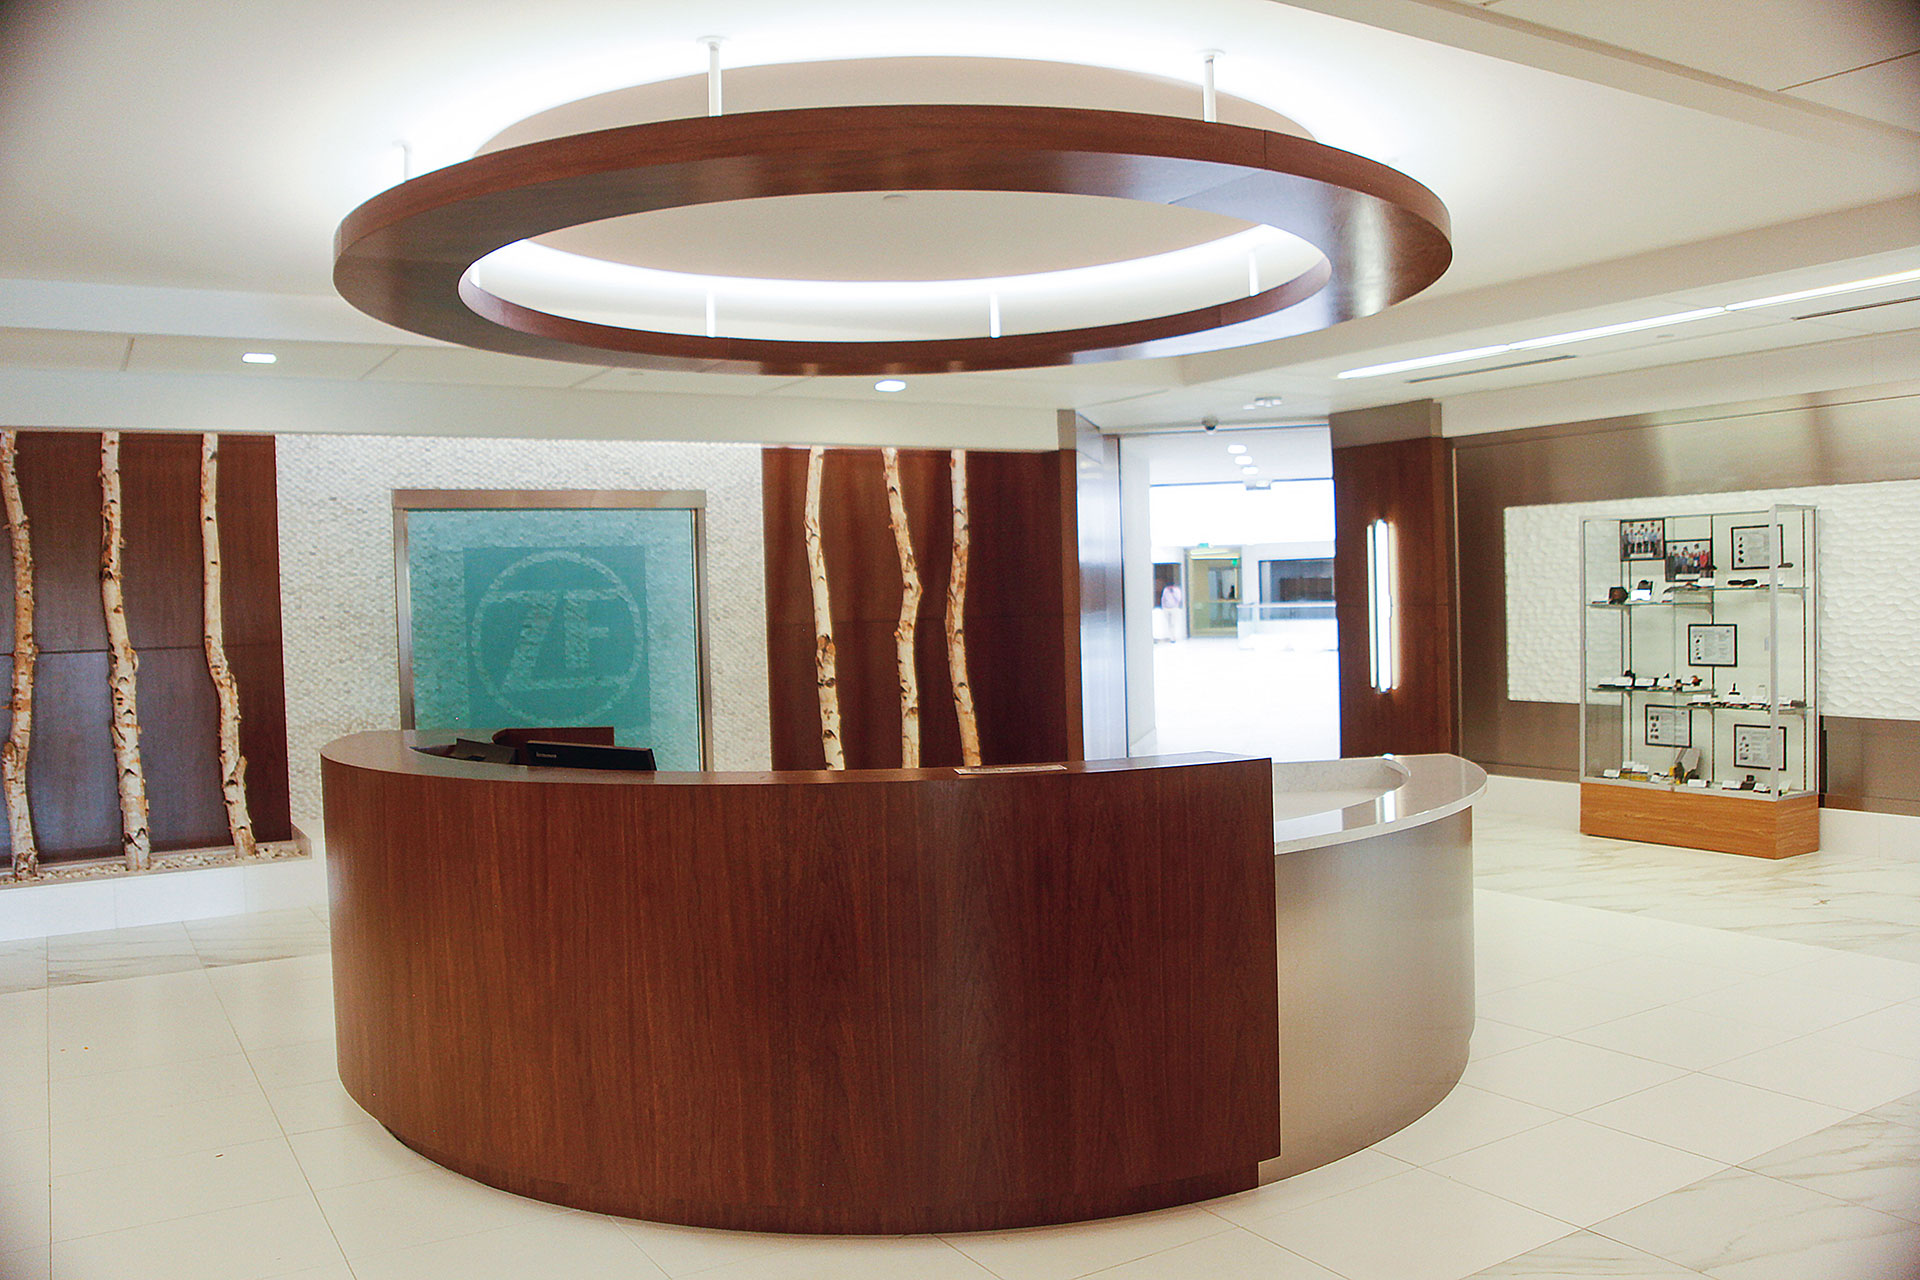 Walnut veneer wall panels and metal-laminate/textured painted wall panels. Walnut veneered hanging soffit and matching custom reception desk with walnut veneer/metal laminate wall and quartz countertops.